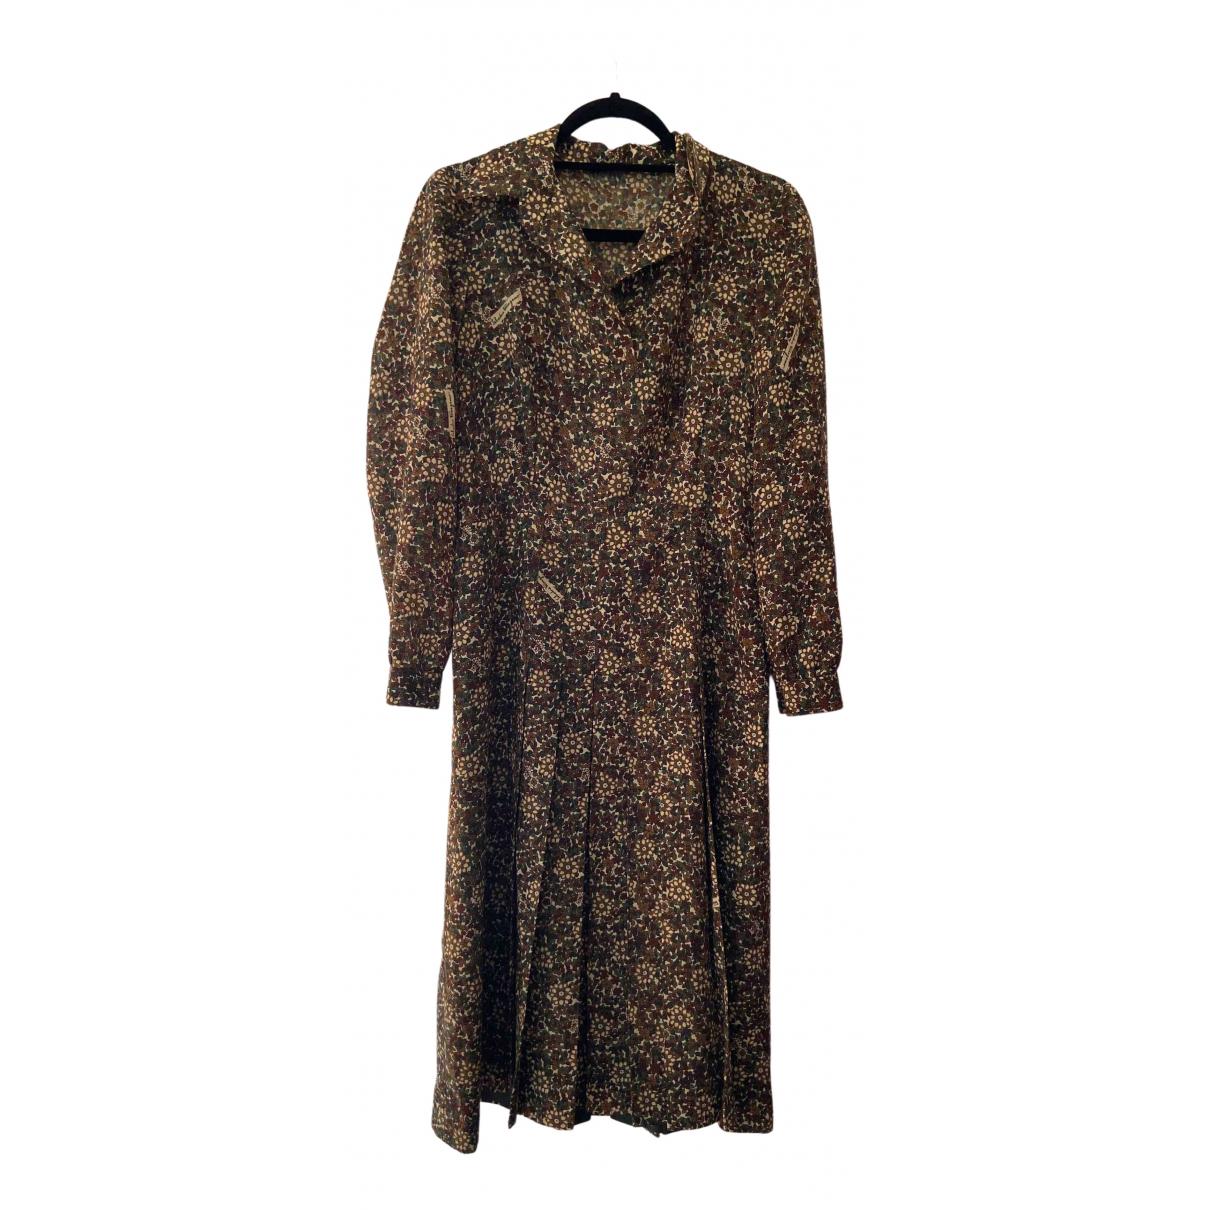 Salvatore Ferragamo - Robe   pour femme en coton - multicolore